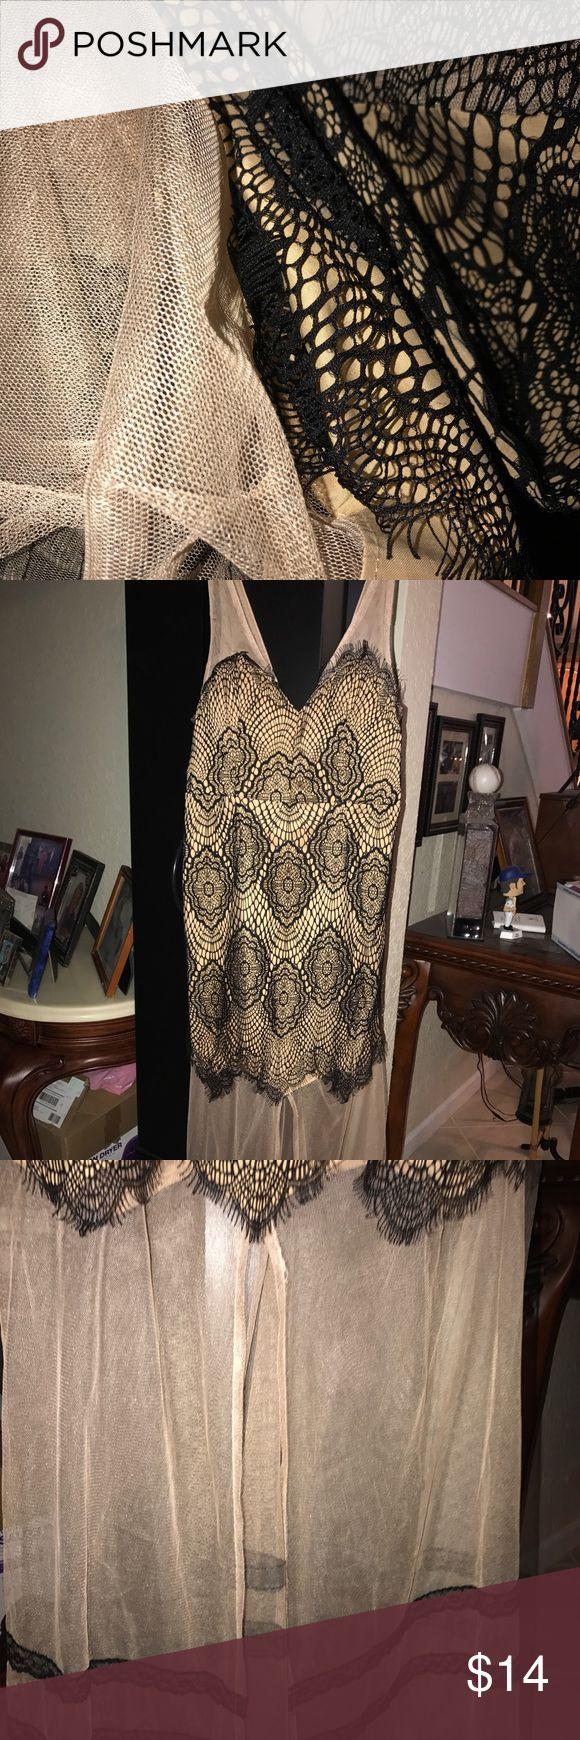 Black & Nude maxi dress Vintage fitted dress Dresses Maxi